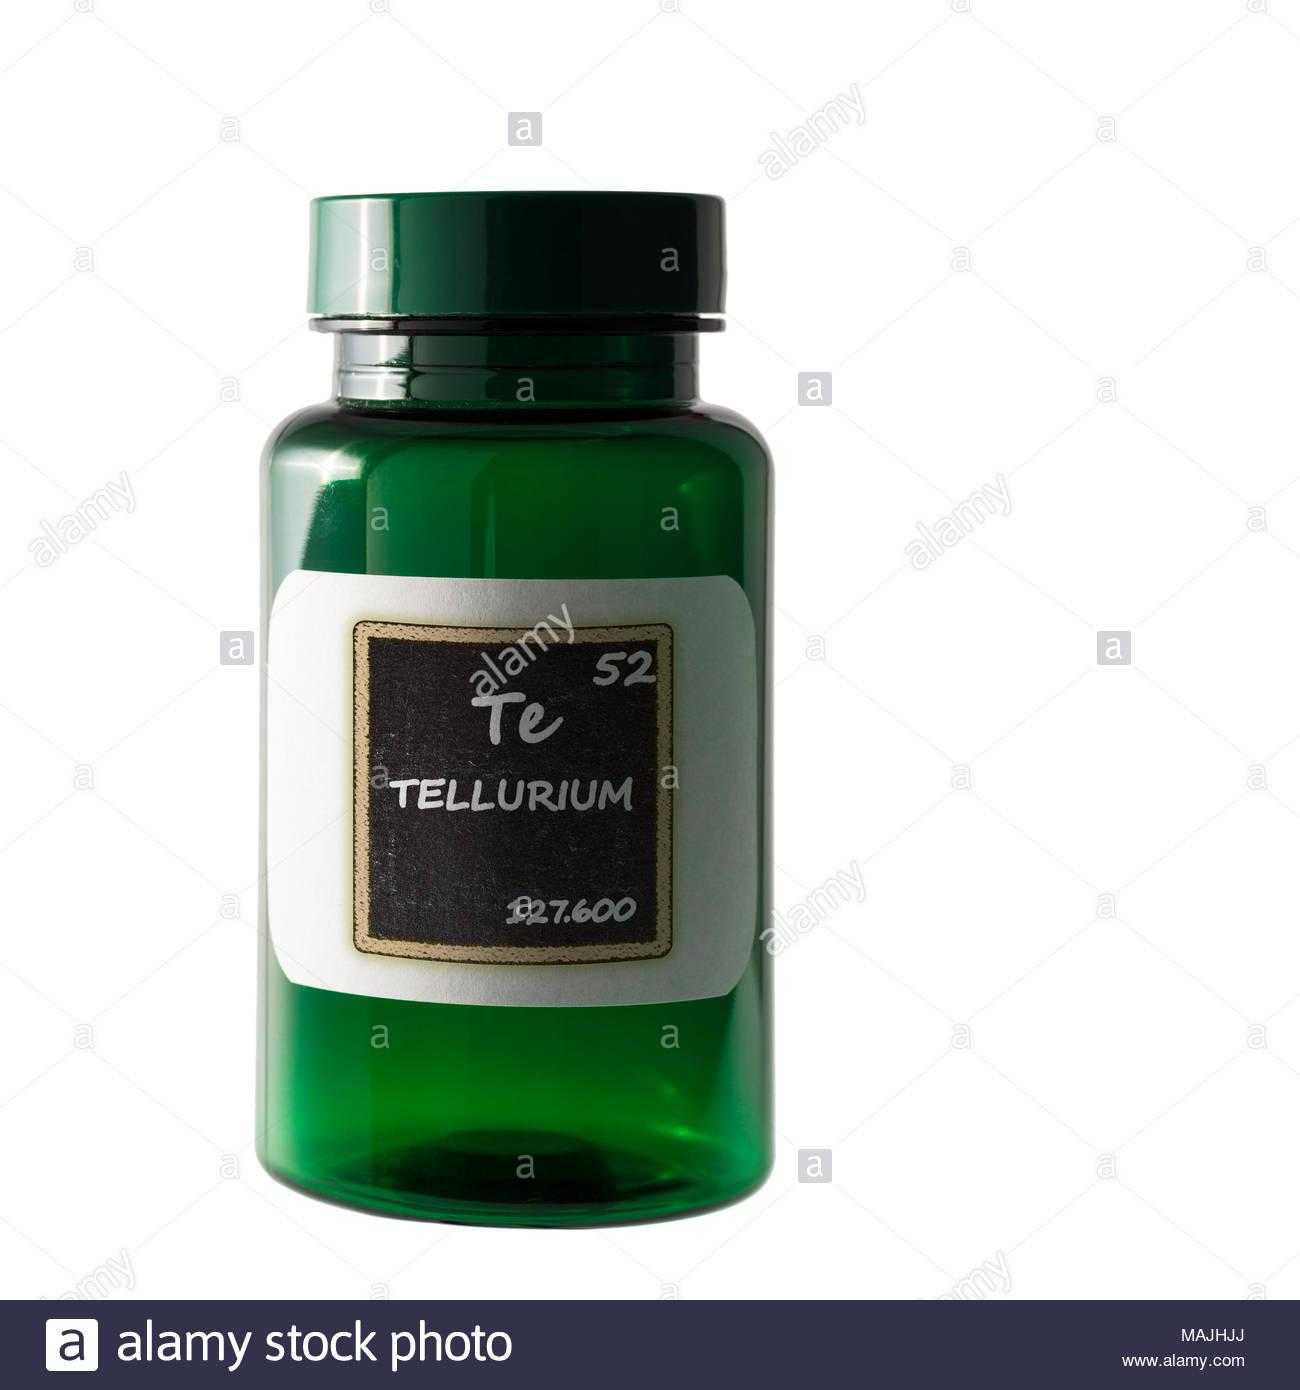 Tellurium Periodic Table Details Shown On Bottle Label Stock Photo